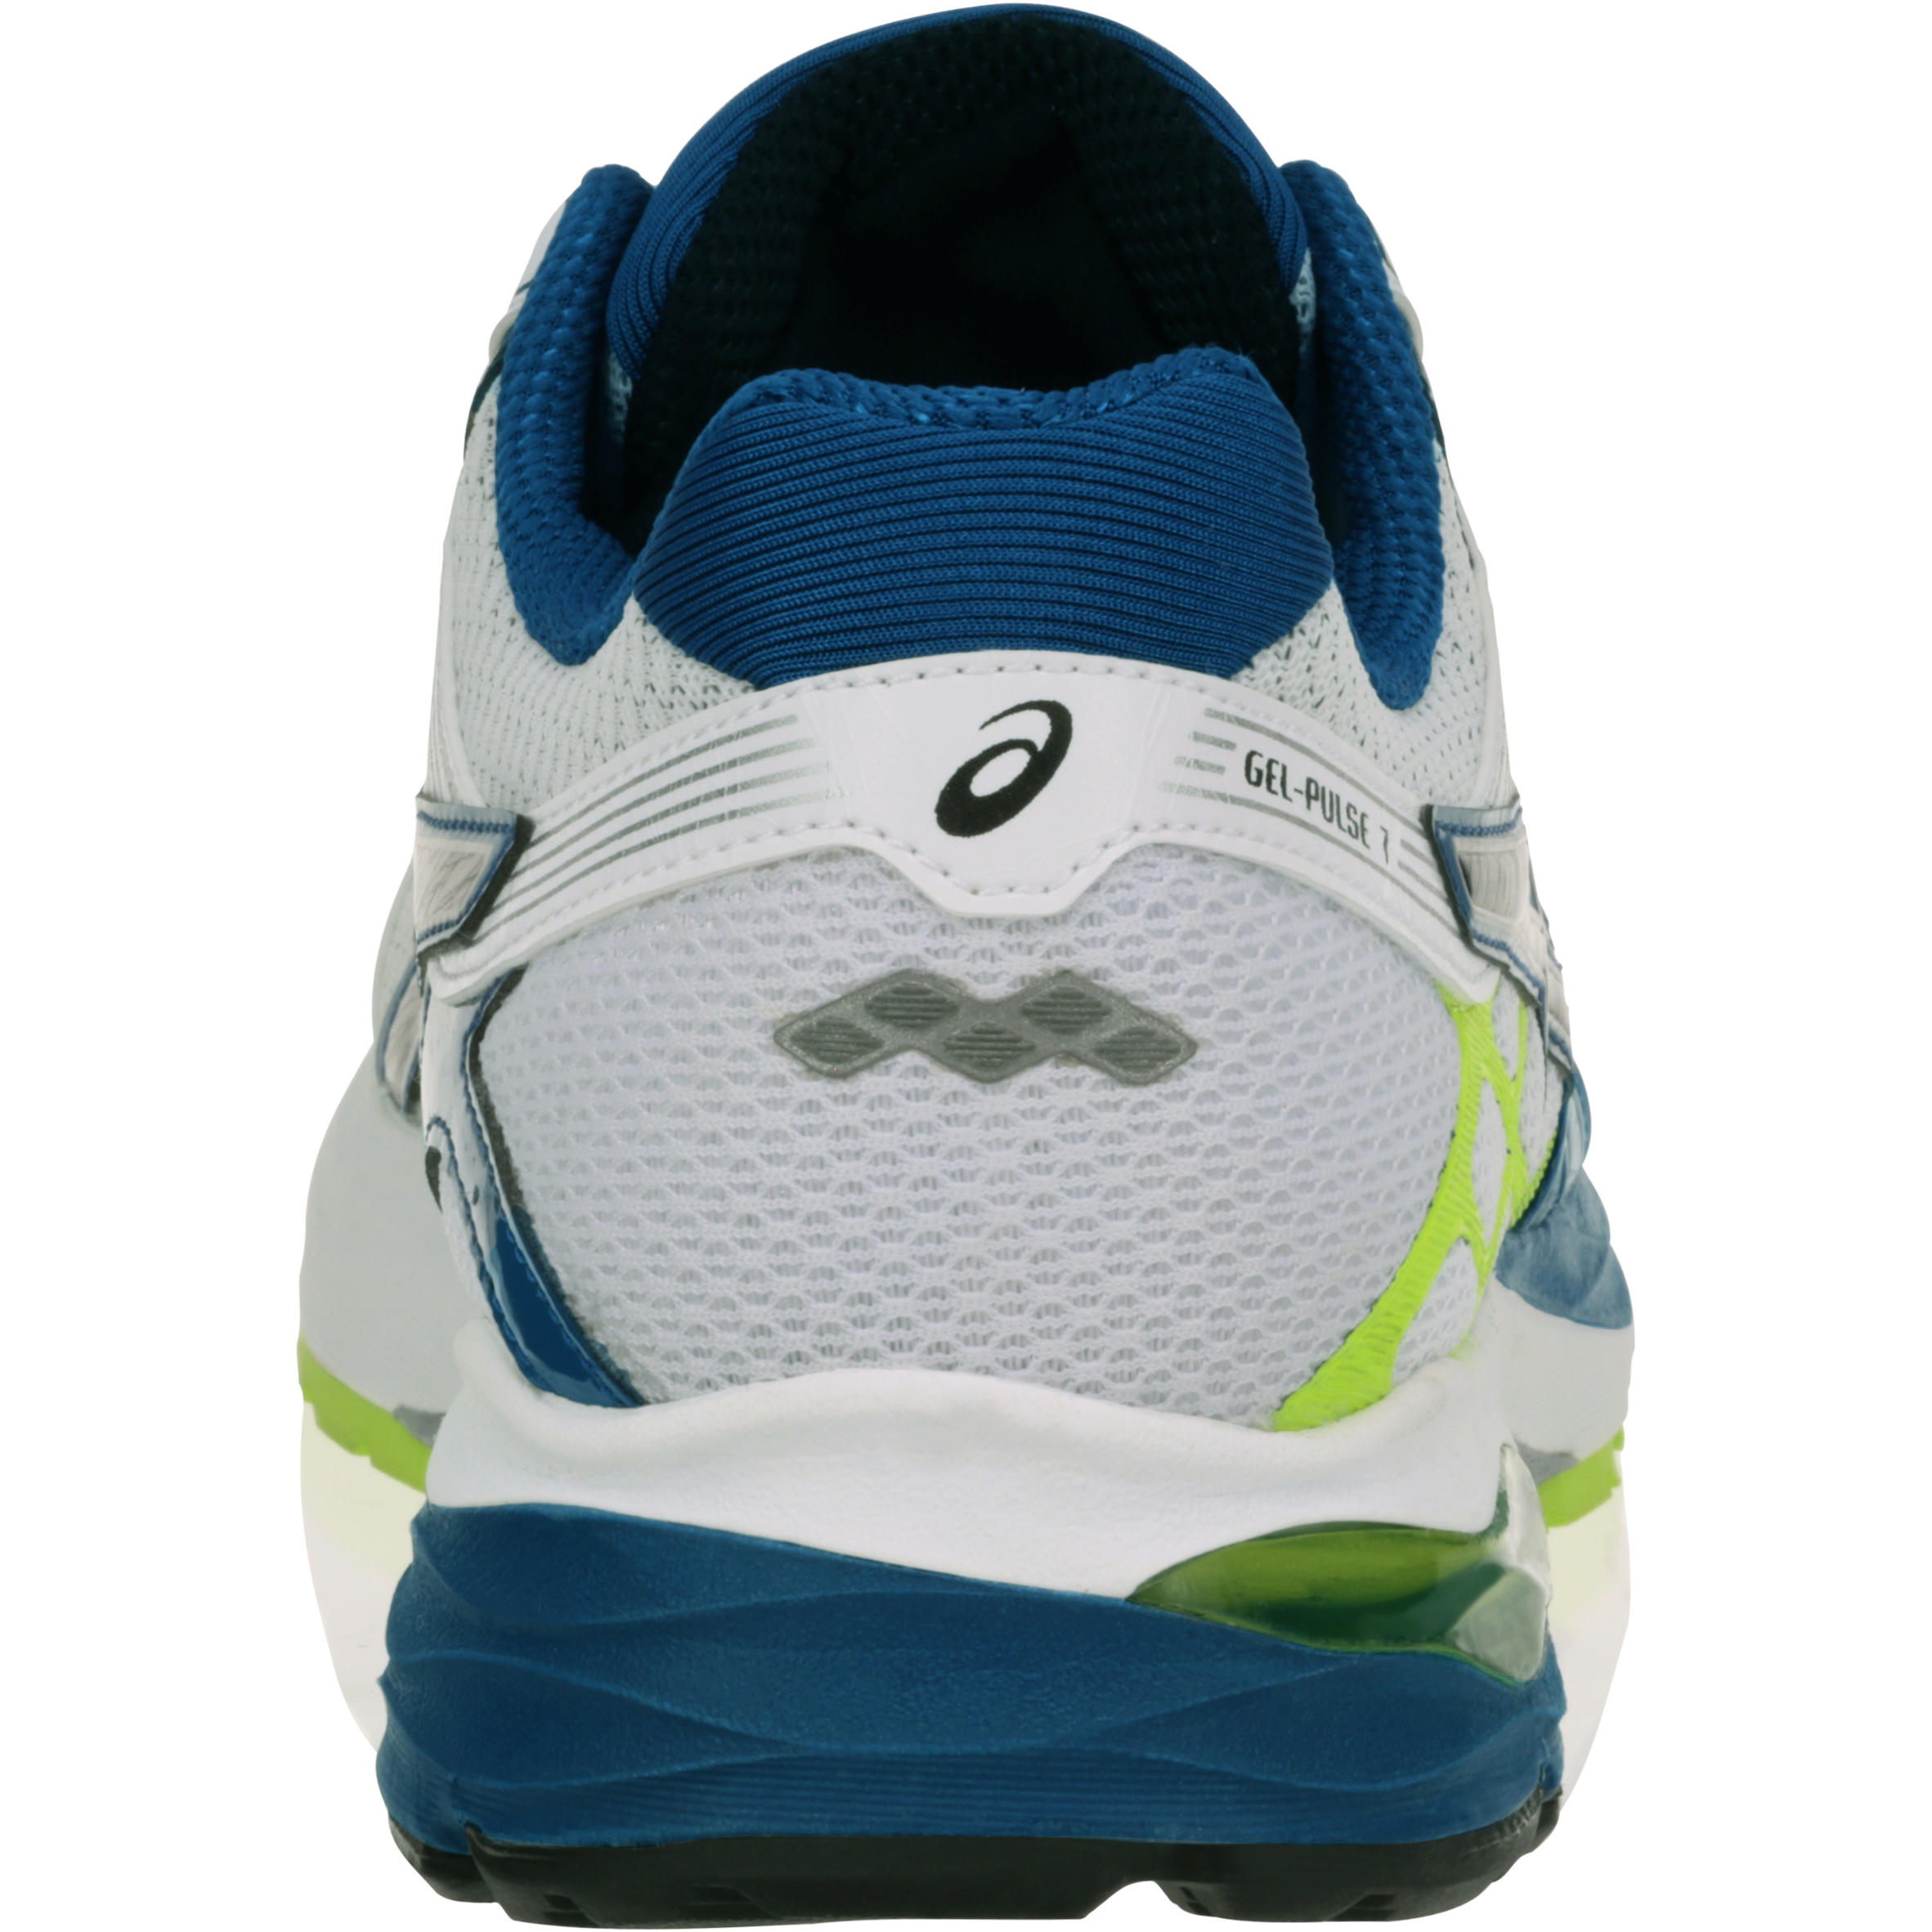 Chaussures Running Gel 7 Homme Pulse Asics wukZOPTXil